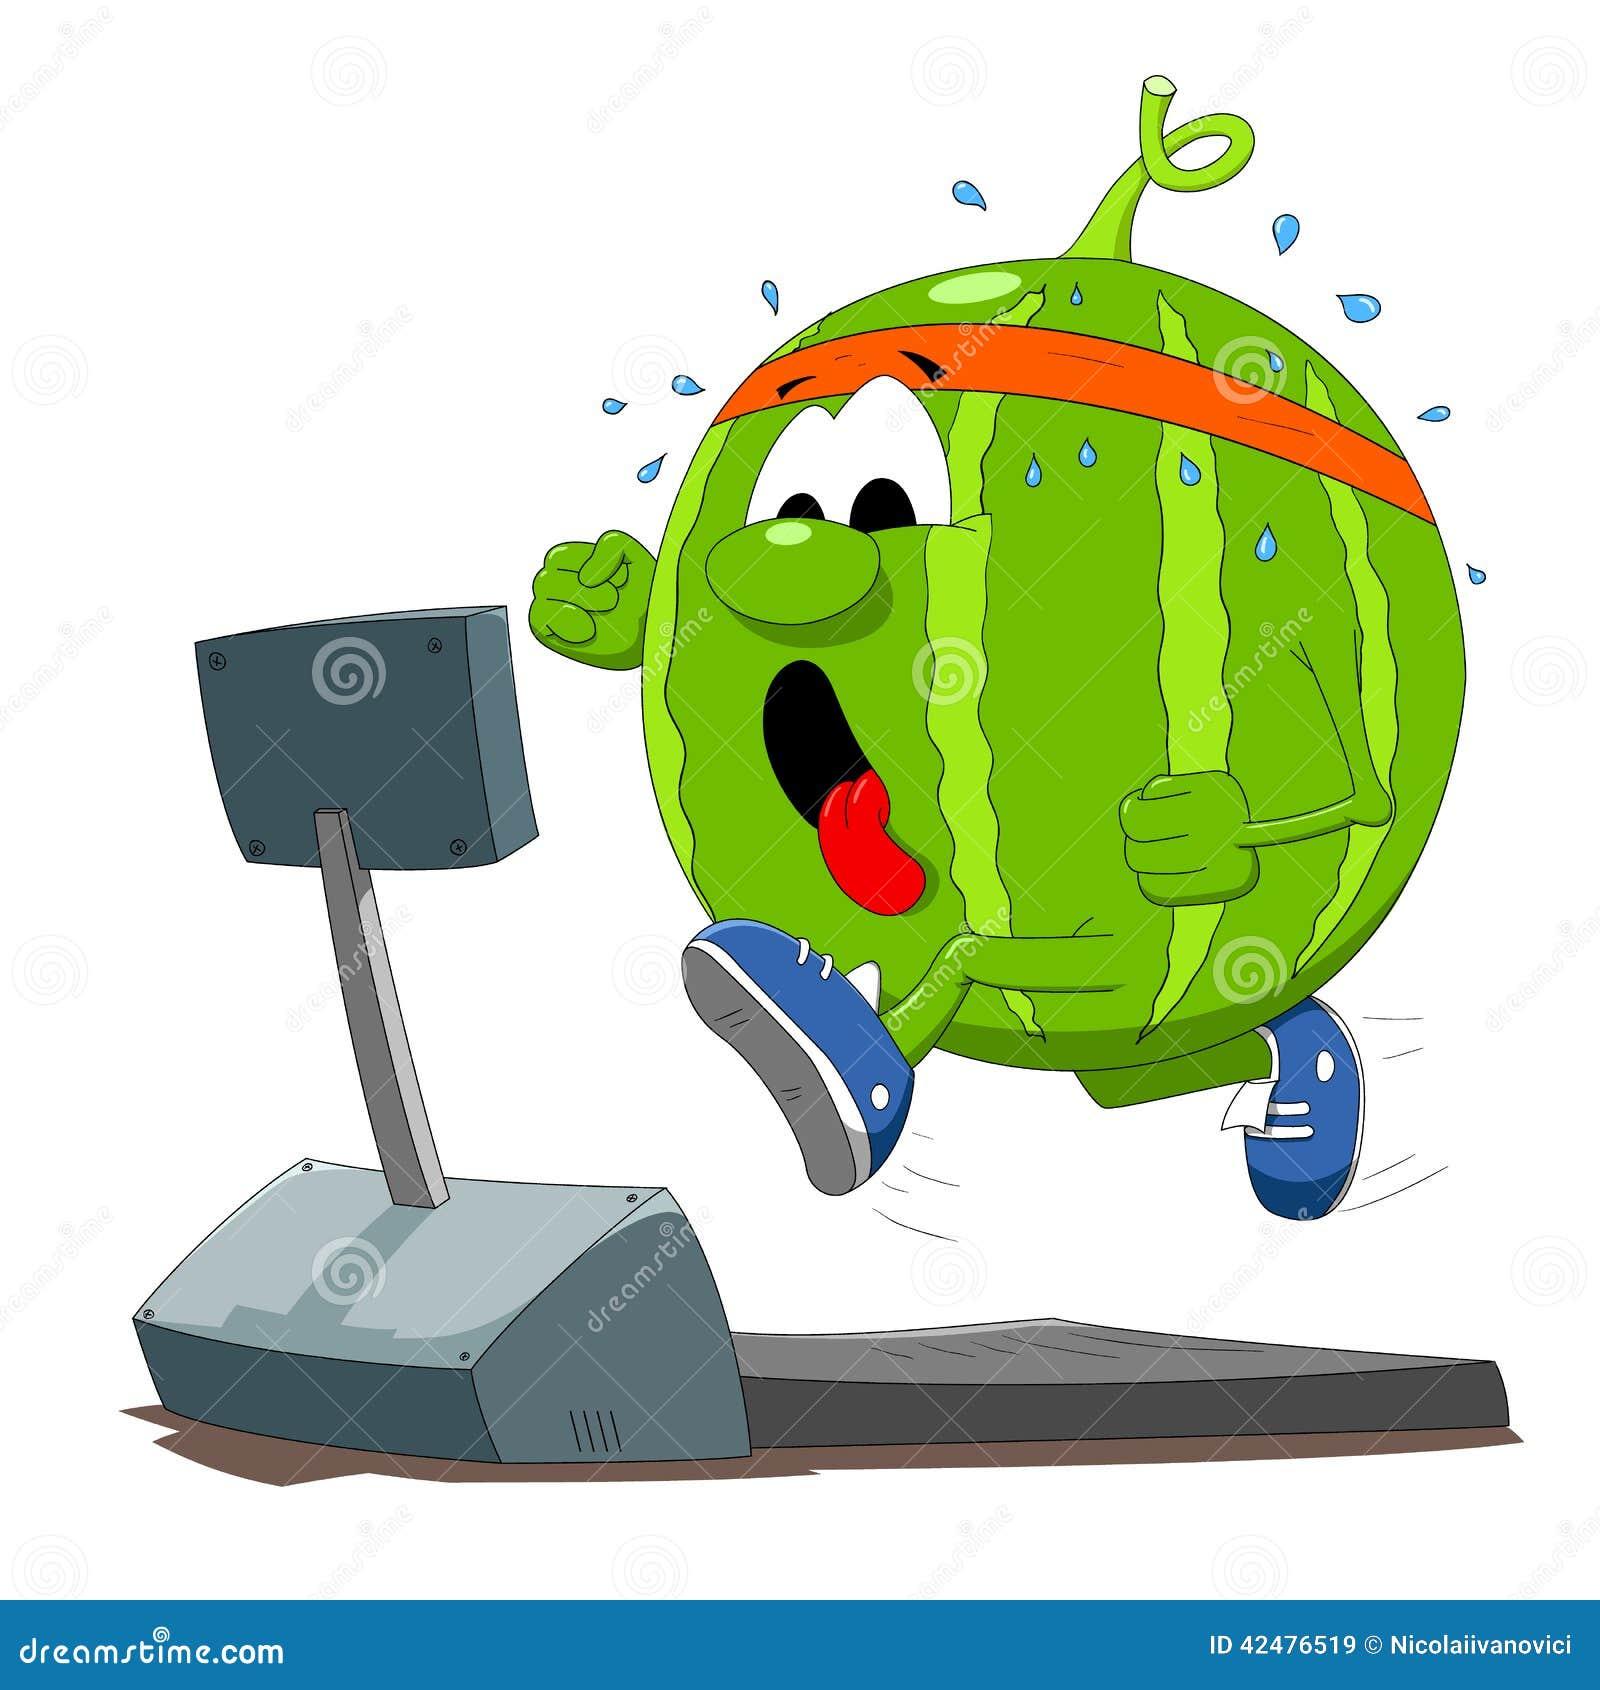 Funny watermelon character on running machine illustration Watermelon Cartoon Characters